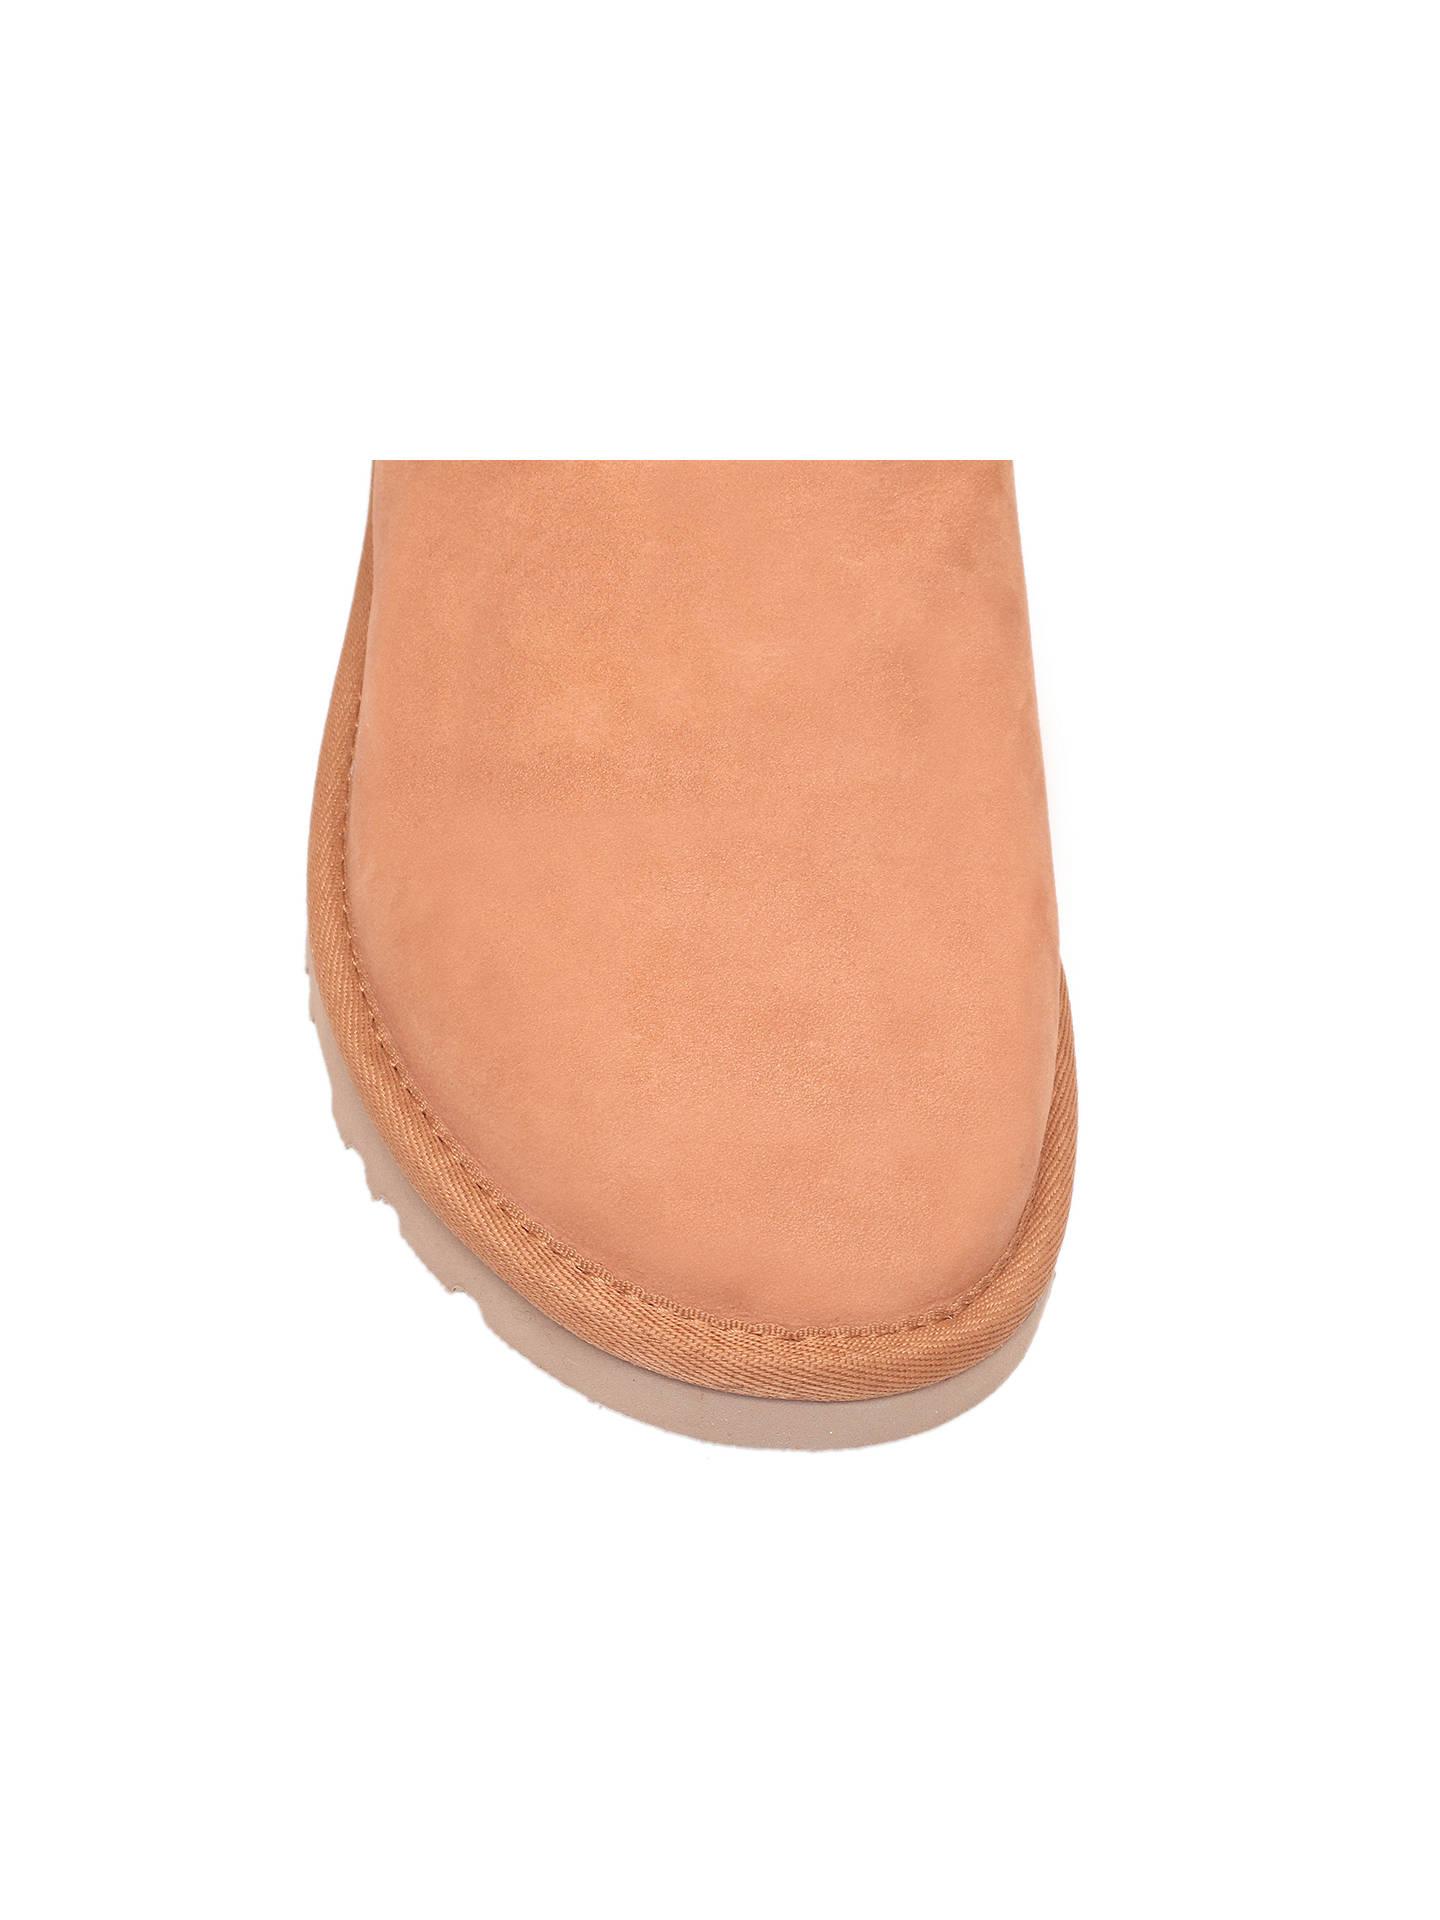 e4dafb8a4a7 Ugg Jocelin Nubuck Buckle Detail Ankle Boots at John Lewis & Partners